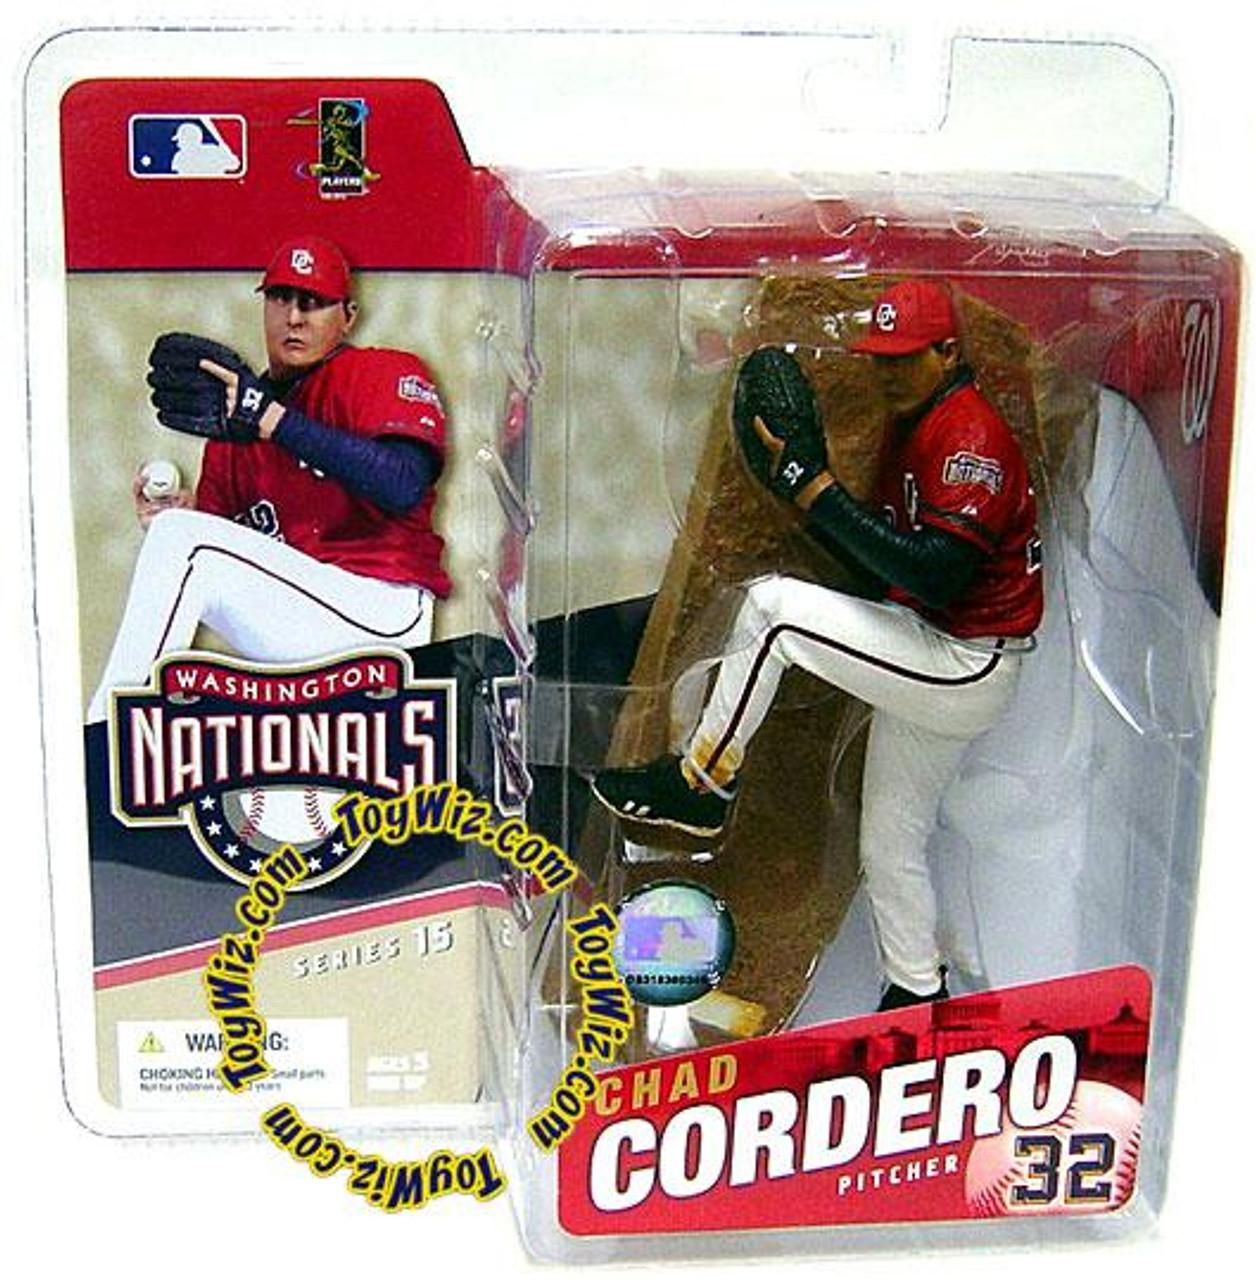 McFarlane Toys MLB Washington Nationals Sports Picks Series 15 Chad Cordero Action Figure [Red Jersey]